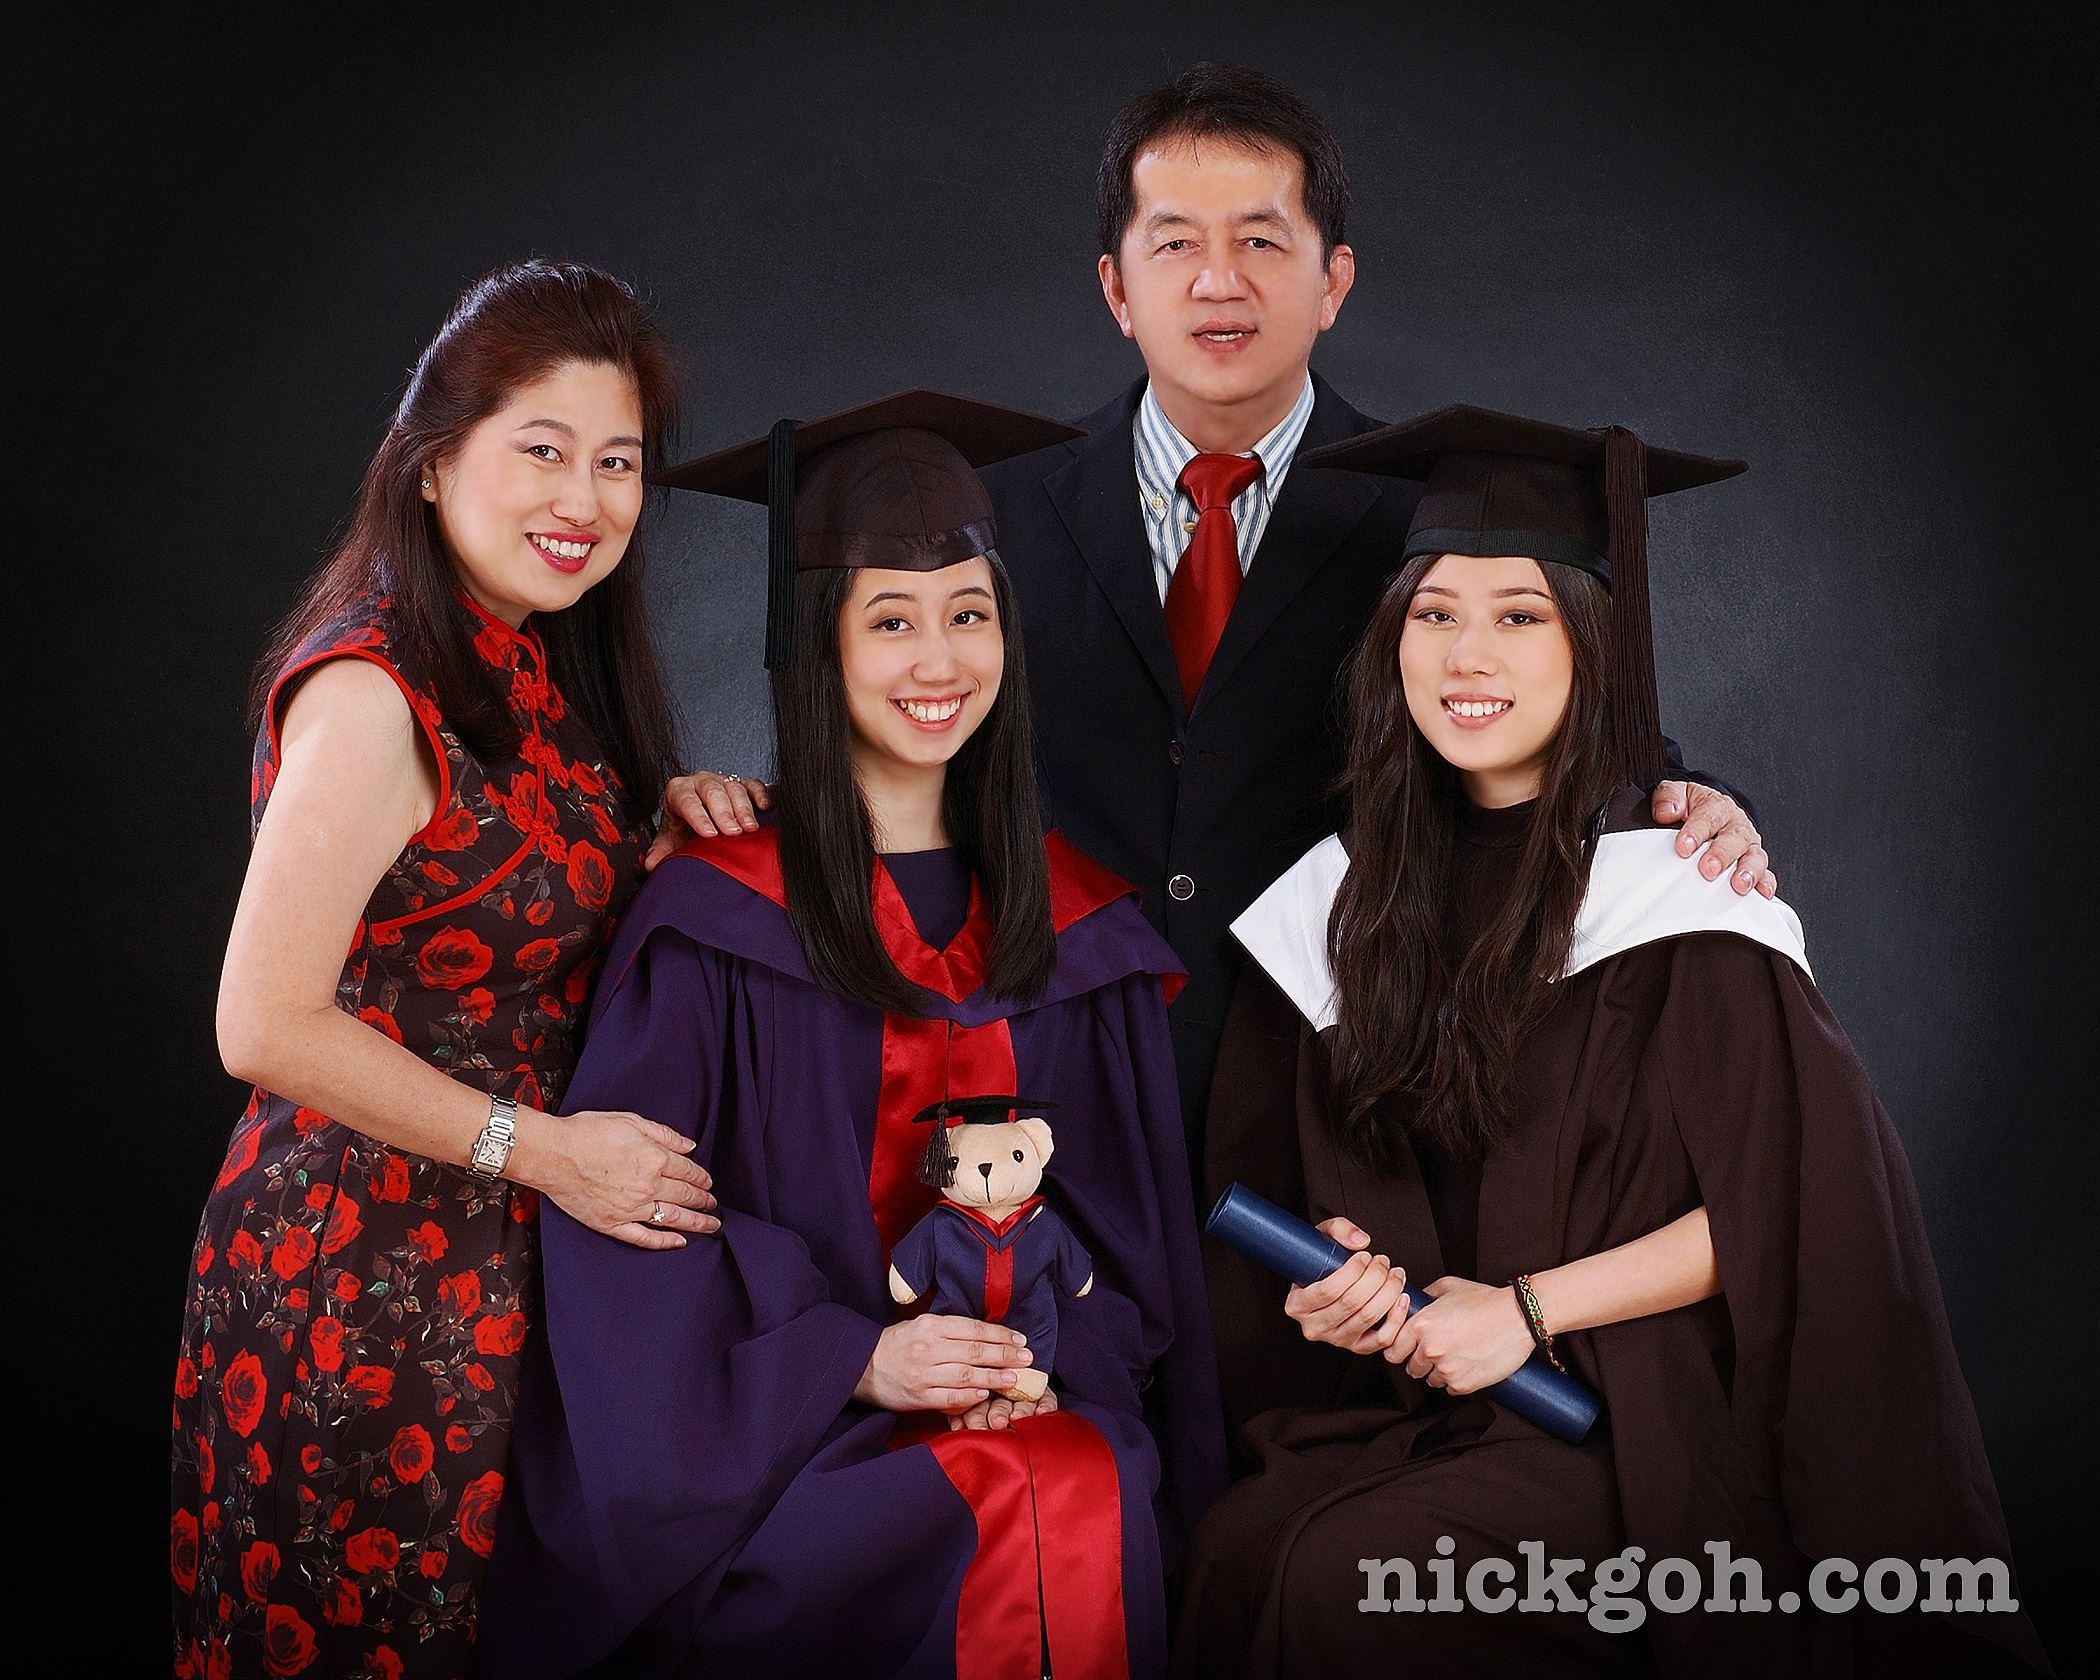 Graduation and Family Photo Singapore - Nick Goh